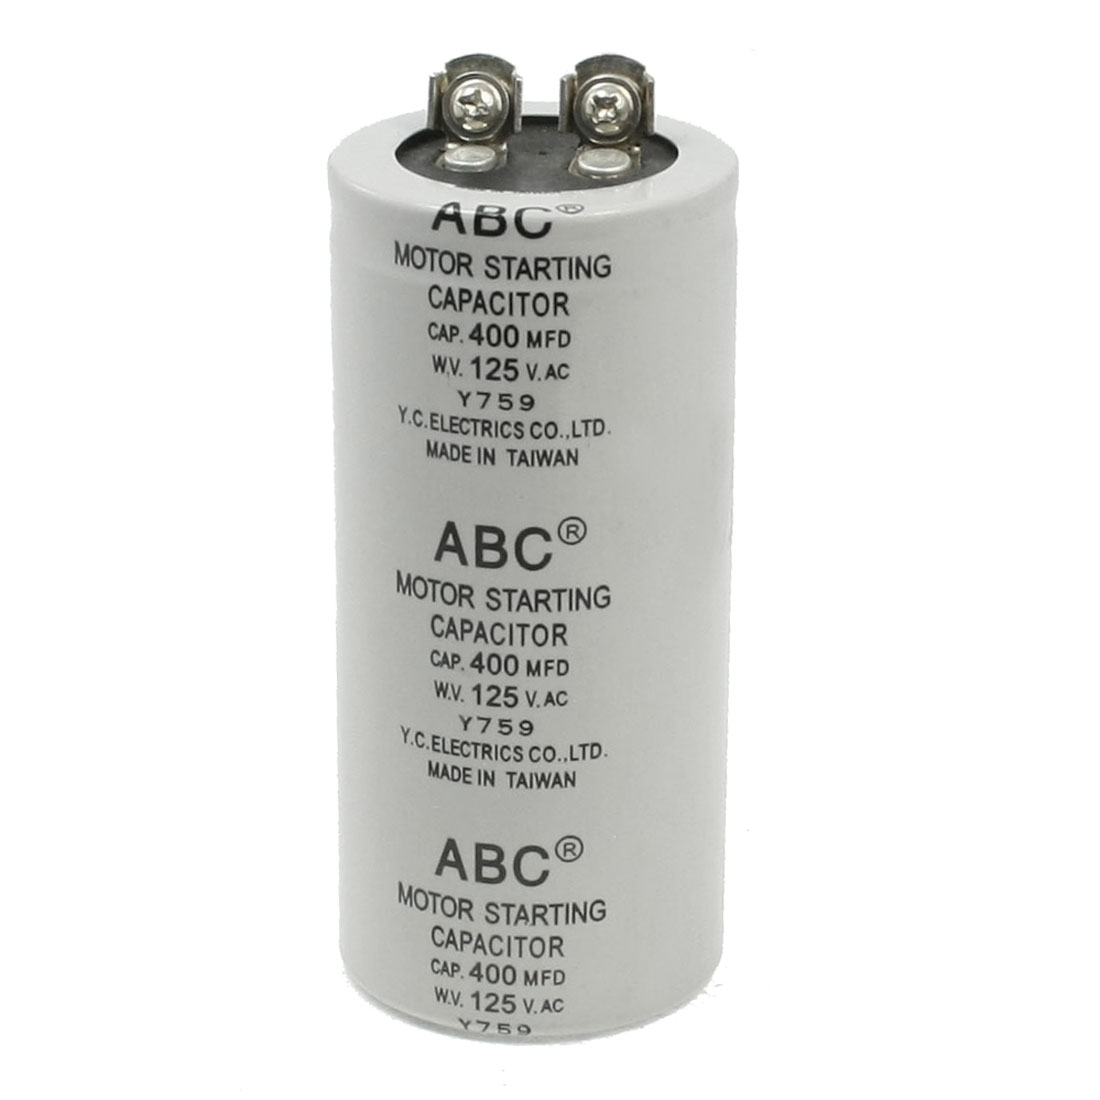 Capacitance Round Polypropylene Film Capacitor AC 125V 400UF